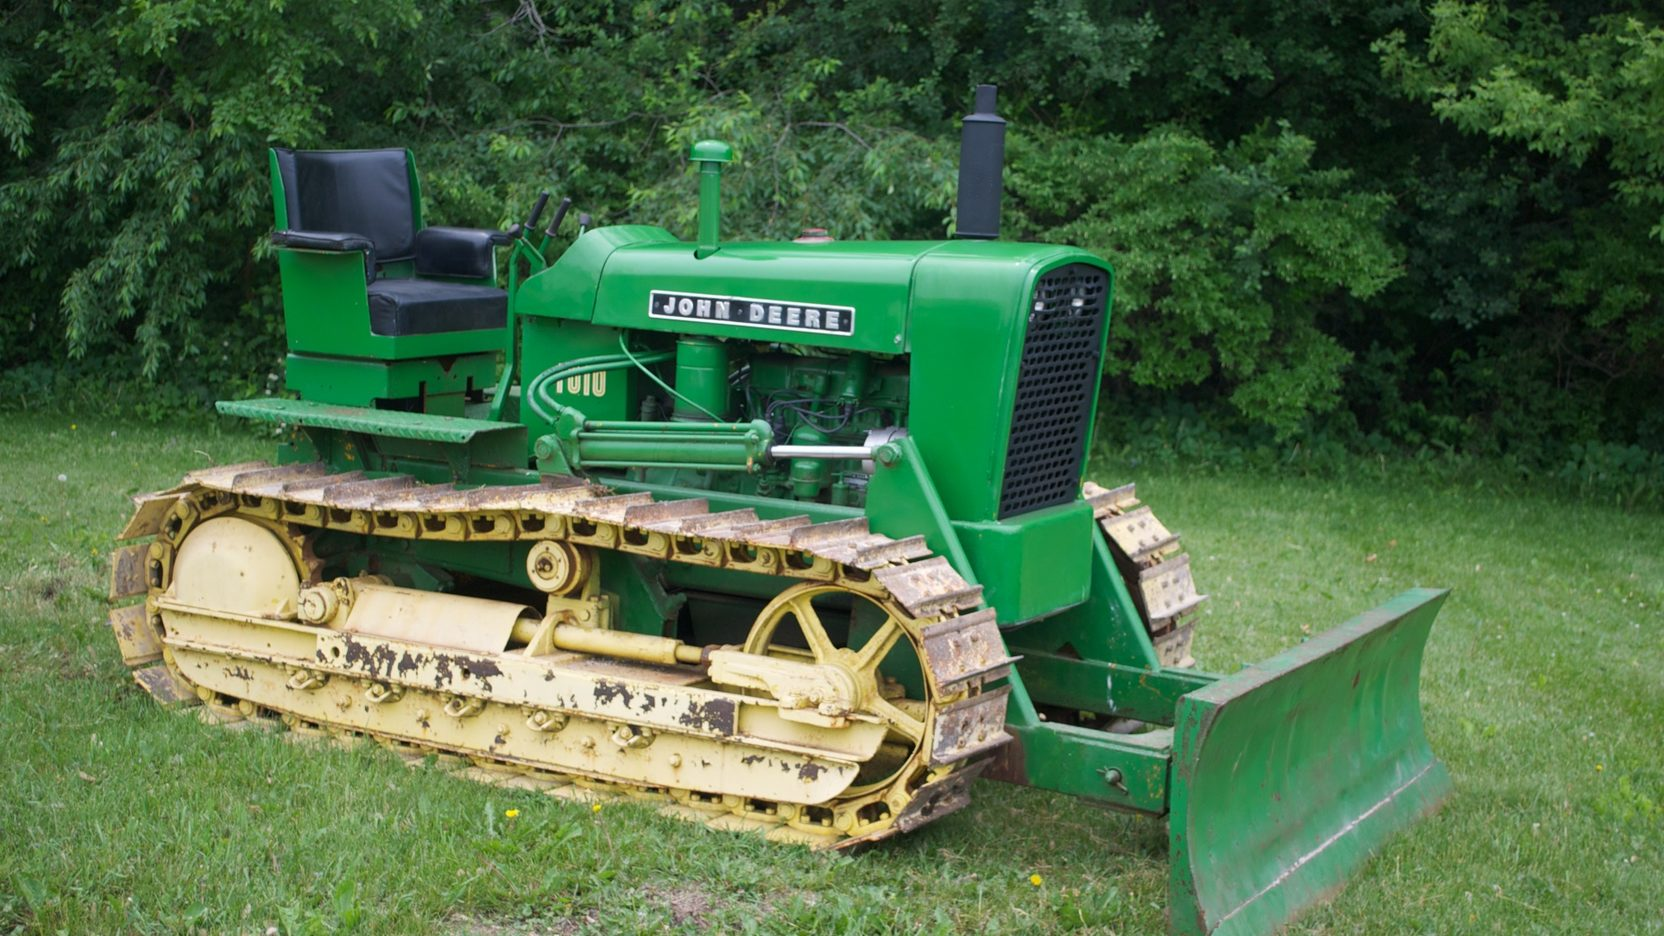 John Deere 1010 Crawler | S125 | Gone Farmin' Summer 2011